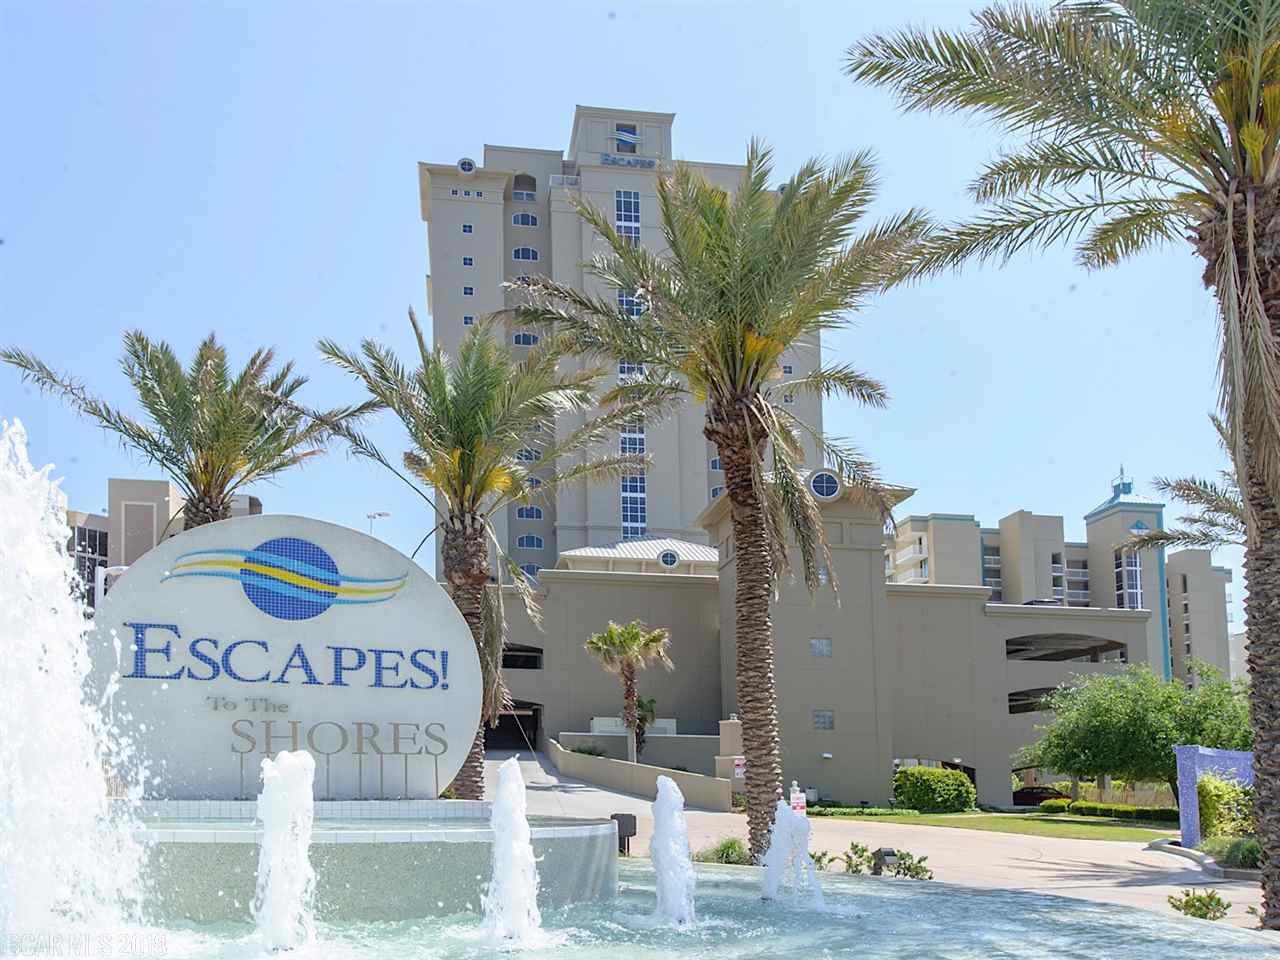 Escapes! To The Shores, Seachase, Four Seasons Condos For Sale, Orange Beach Alabama